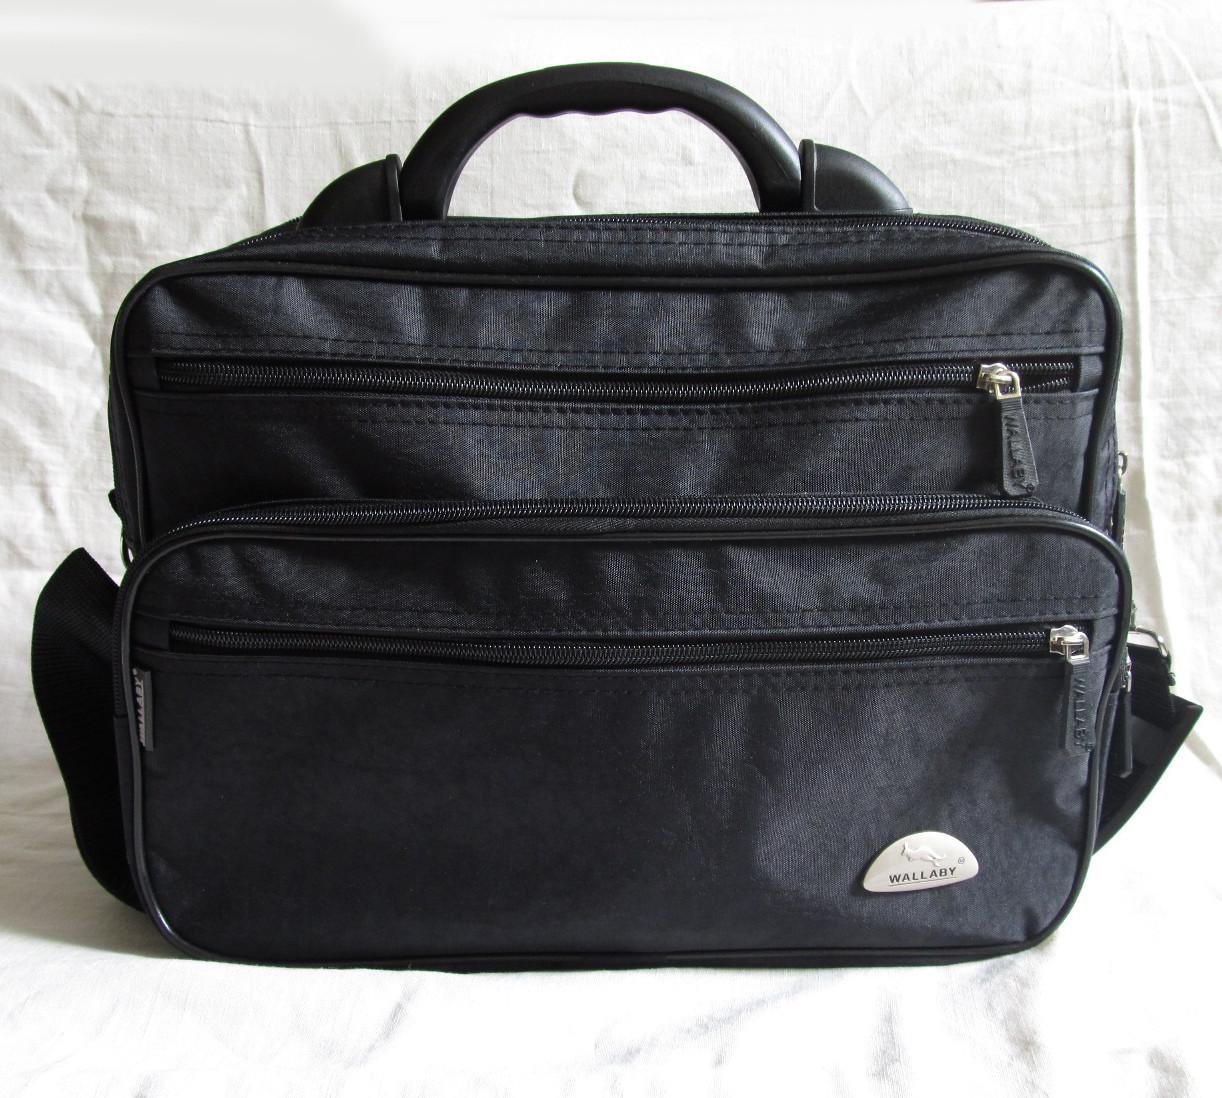 31ac1af6800a Мужская сумка Wallaby 26531 черная полукаркасная барсетка через ...